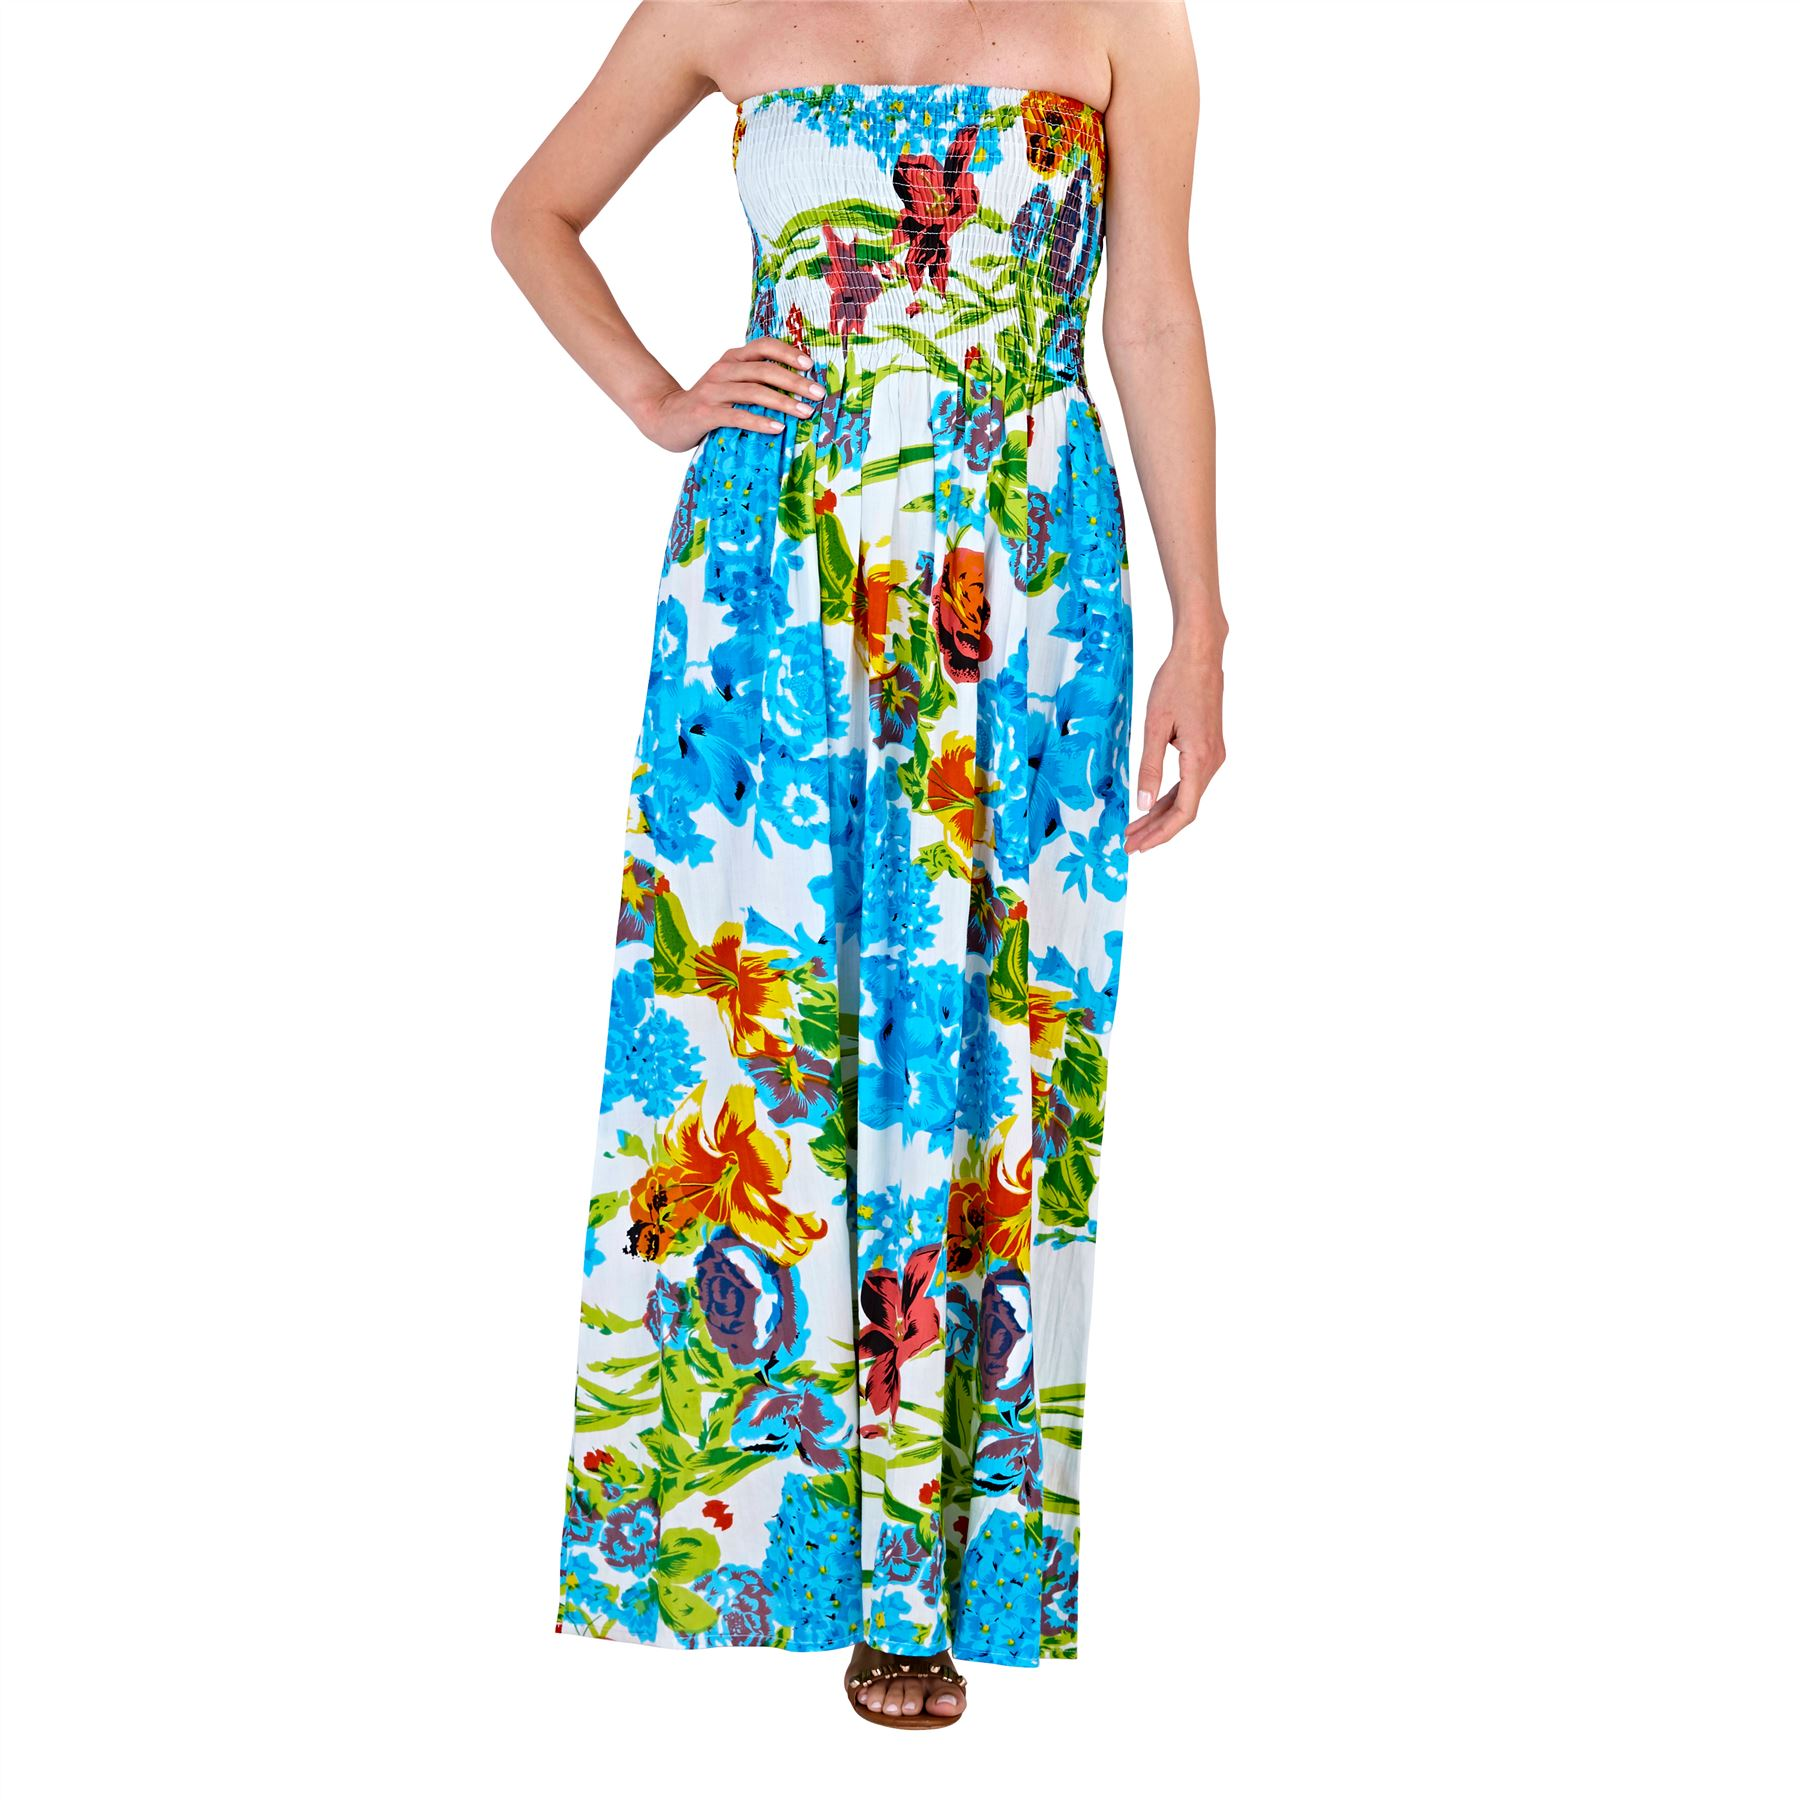 Ladies//Womens Summer Beach Sun Round Neck Maxi Dress Blue//Red Size 8-22 NEW